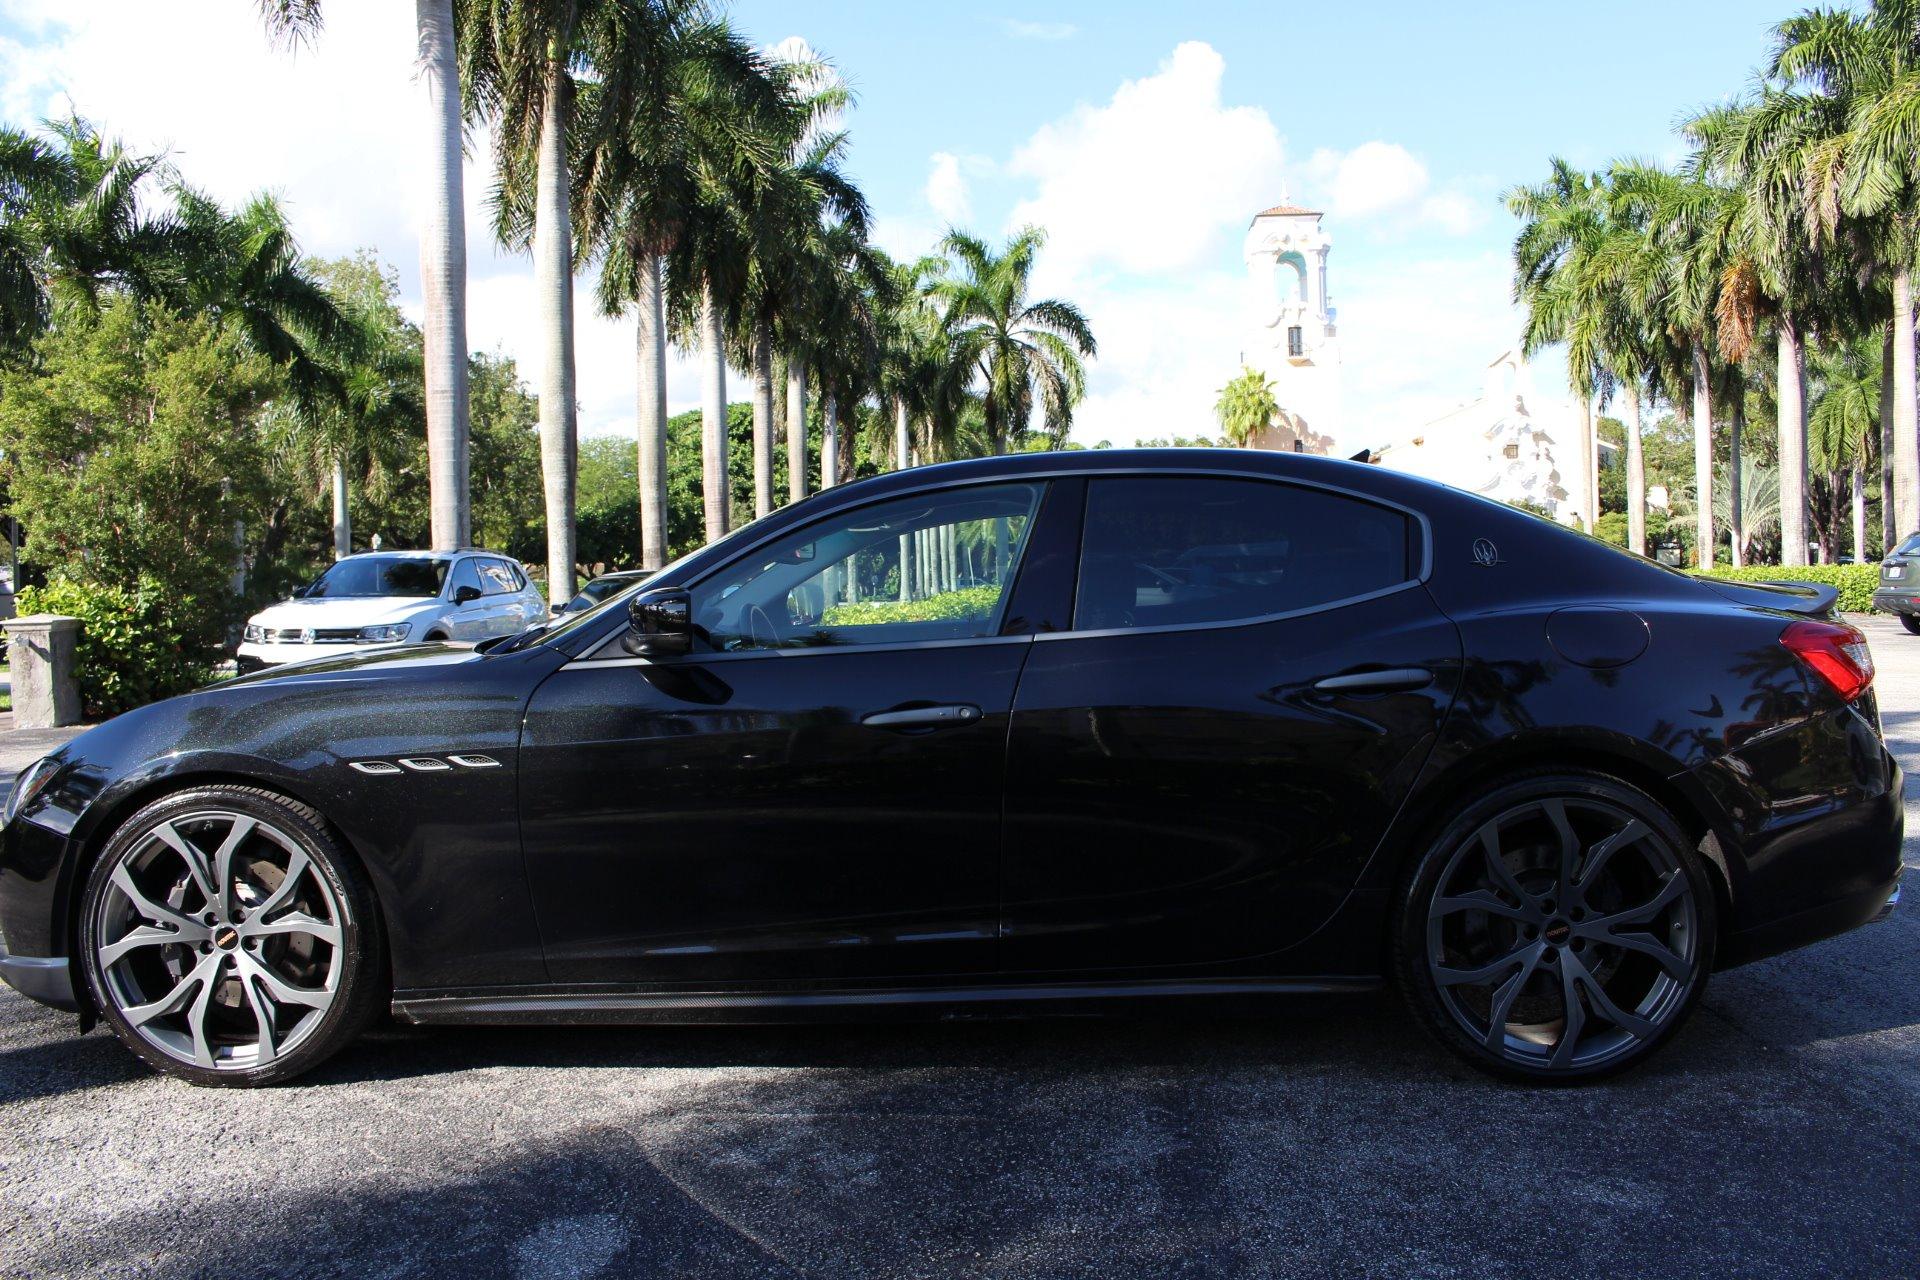 Used 2015 Maserati Ghibli SQ4 Novitec for sale $32,850 at The Gables Sports Cars in Miami FL 33146 3